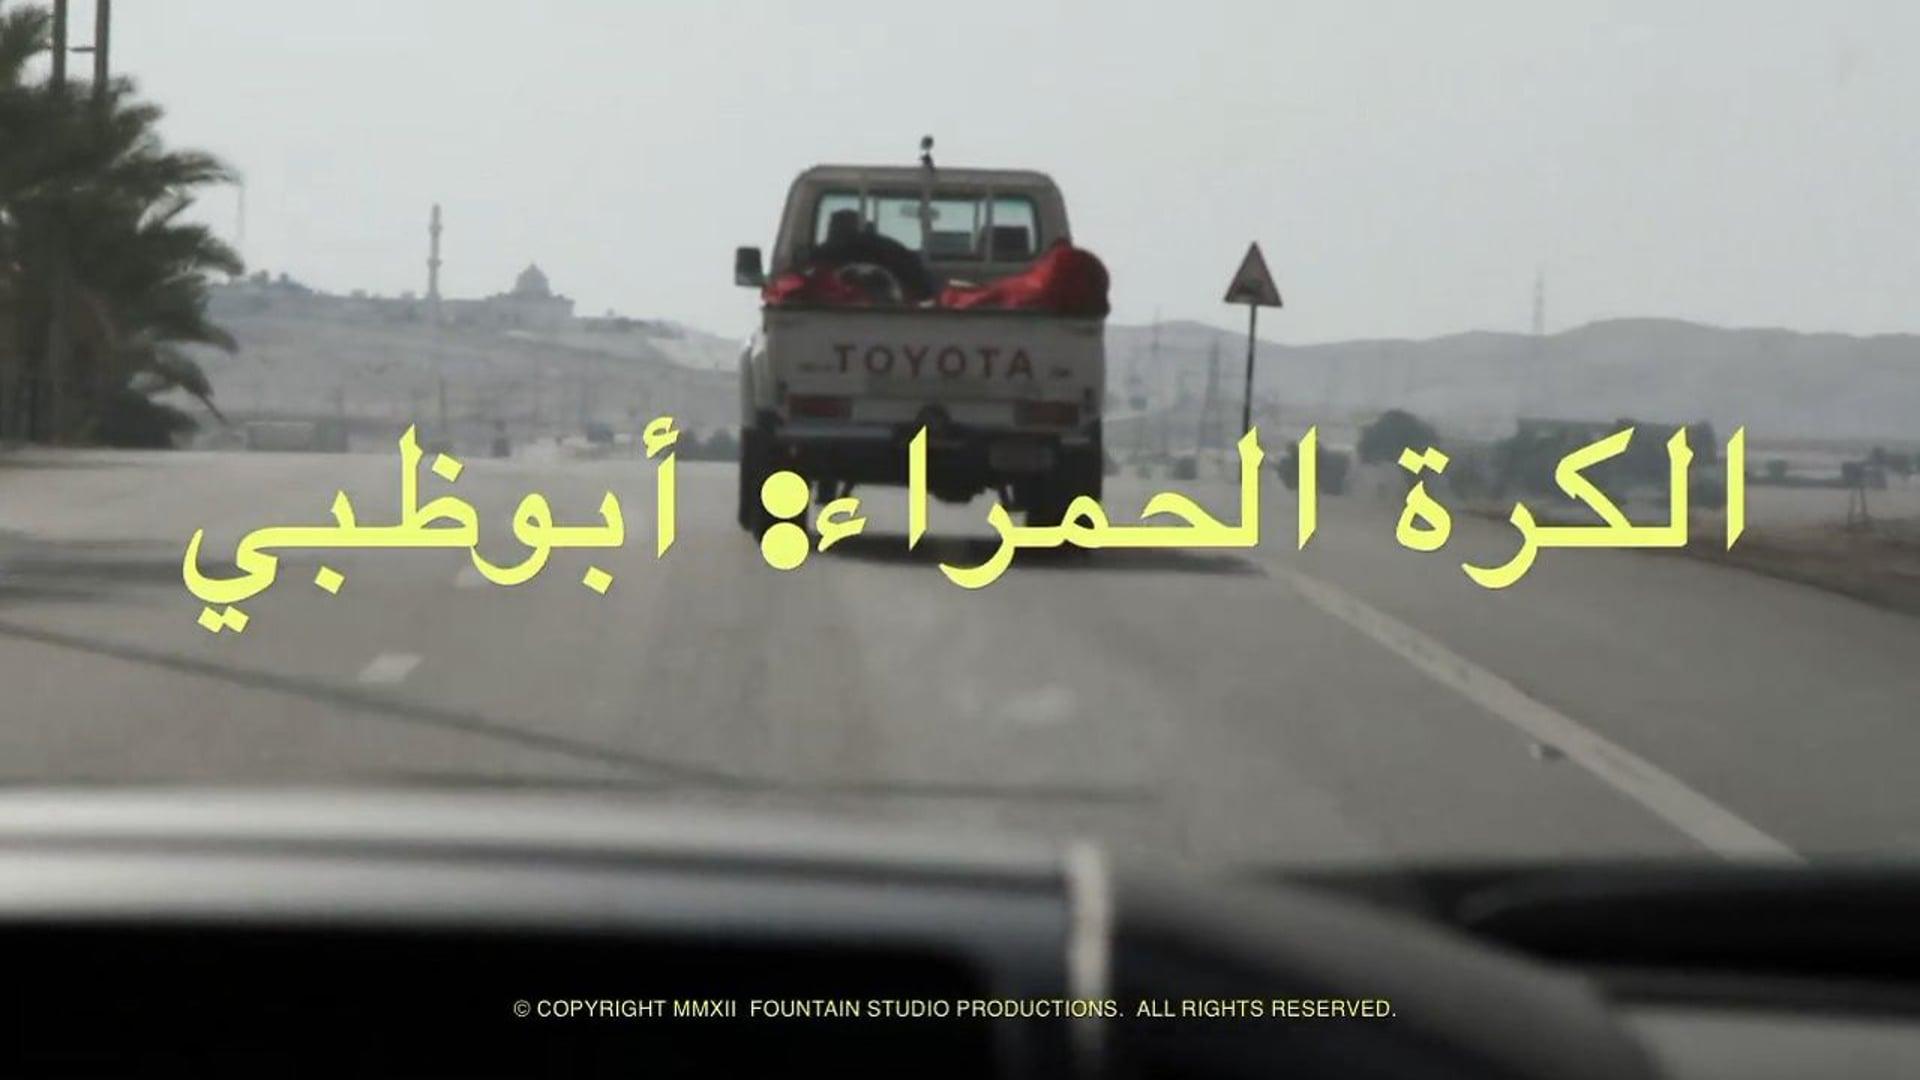 RedBall Abu Dhabi (trailer)